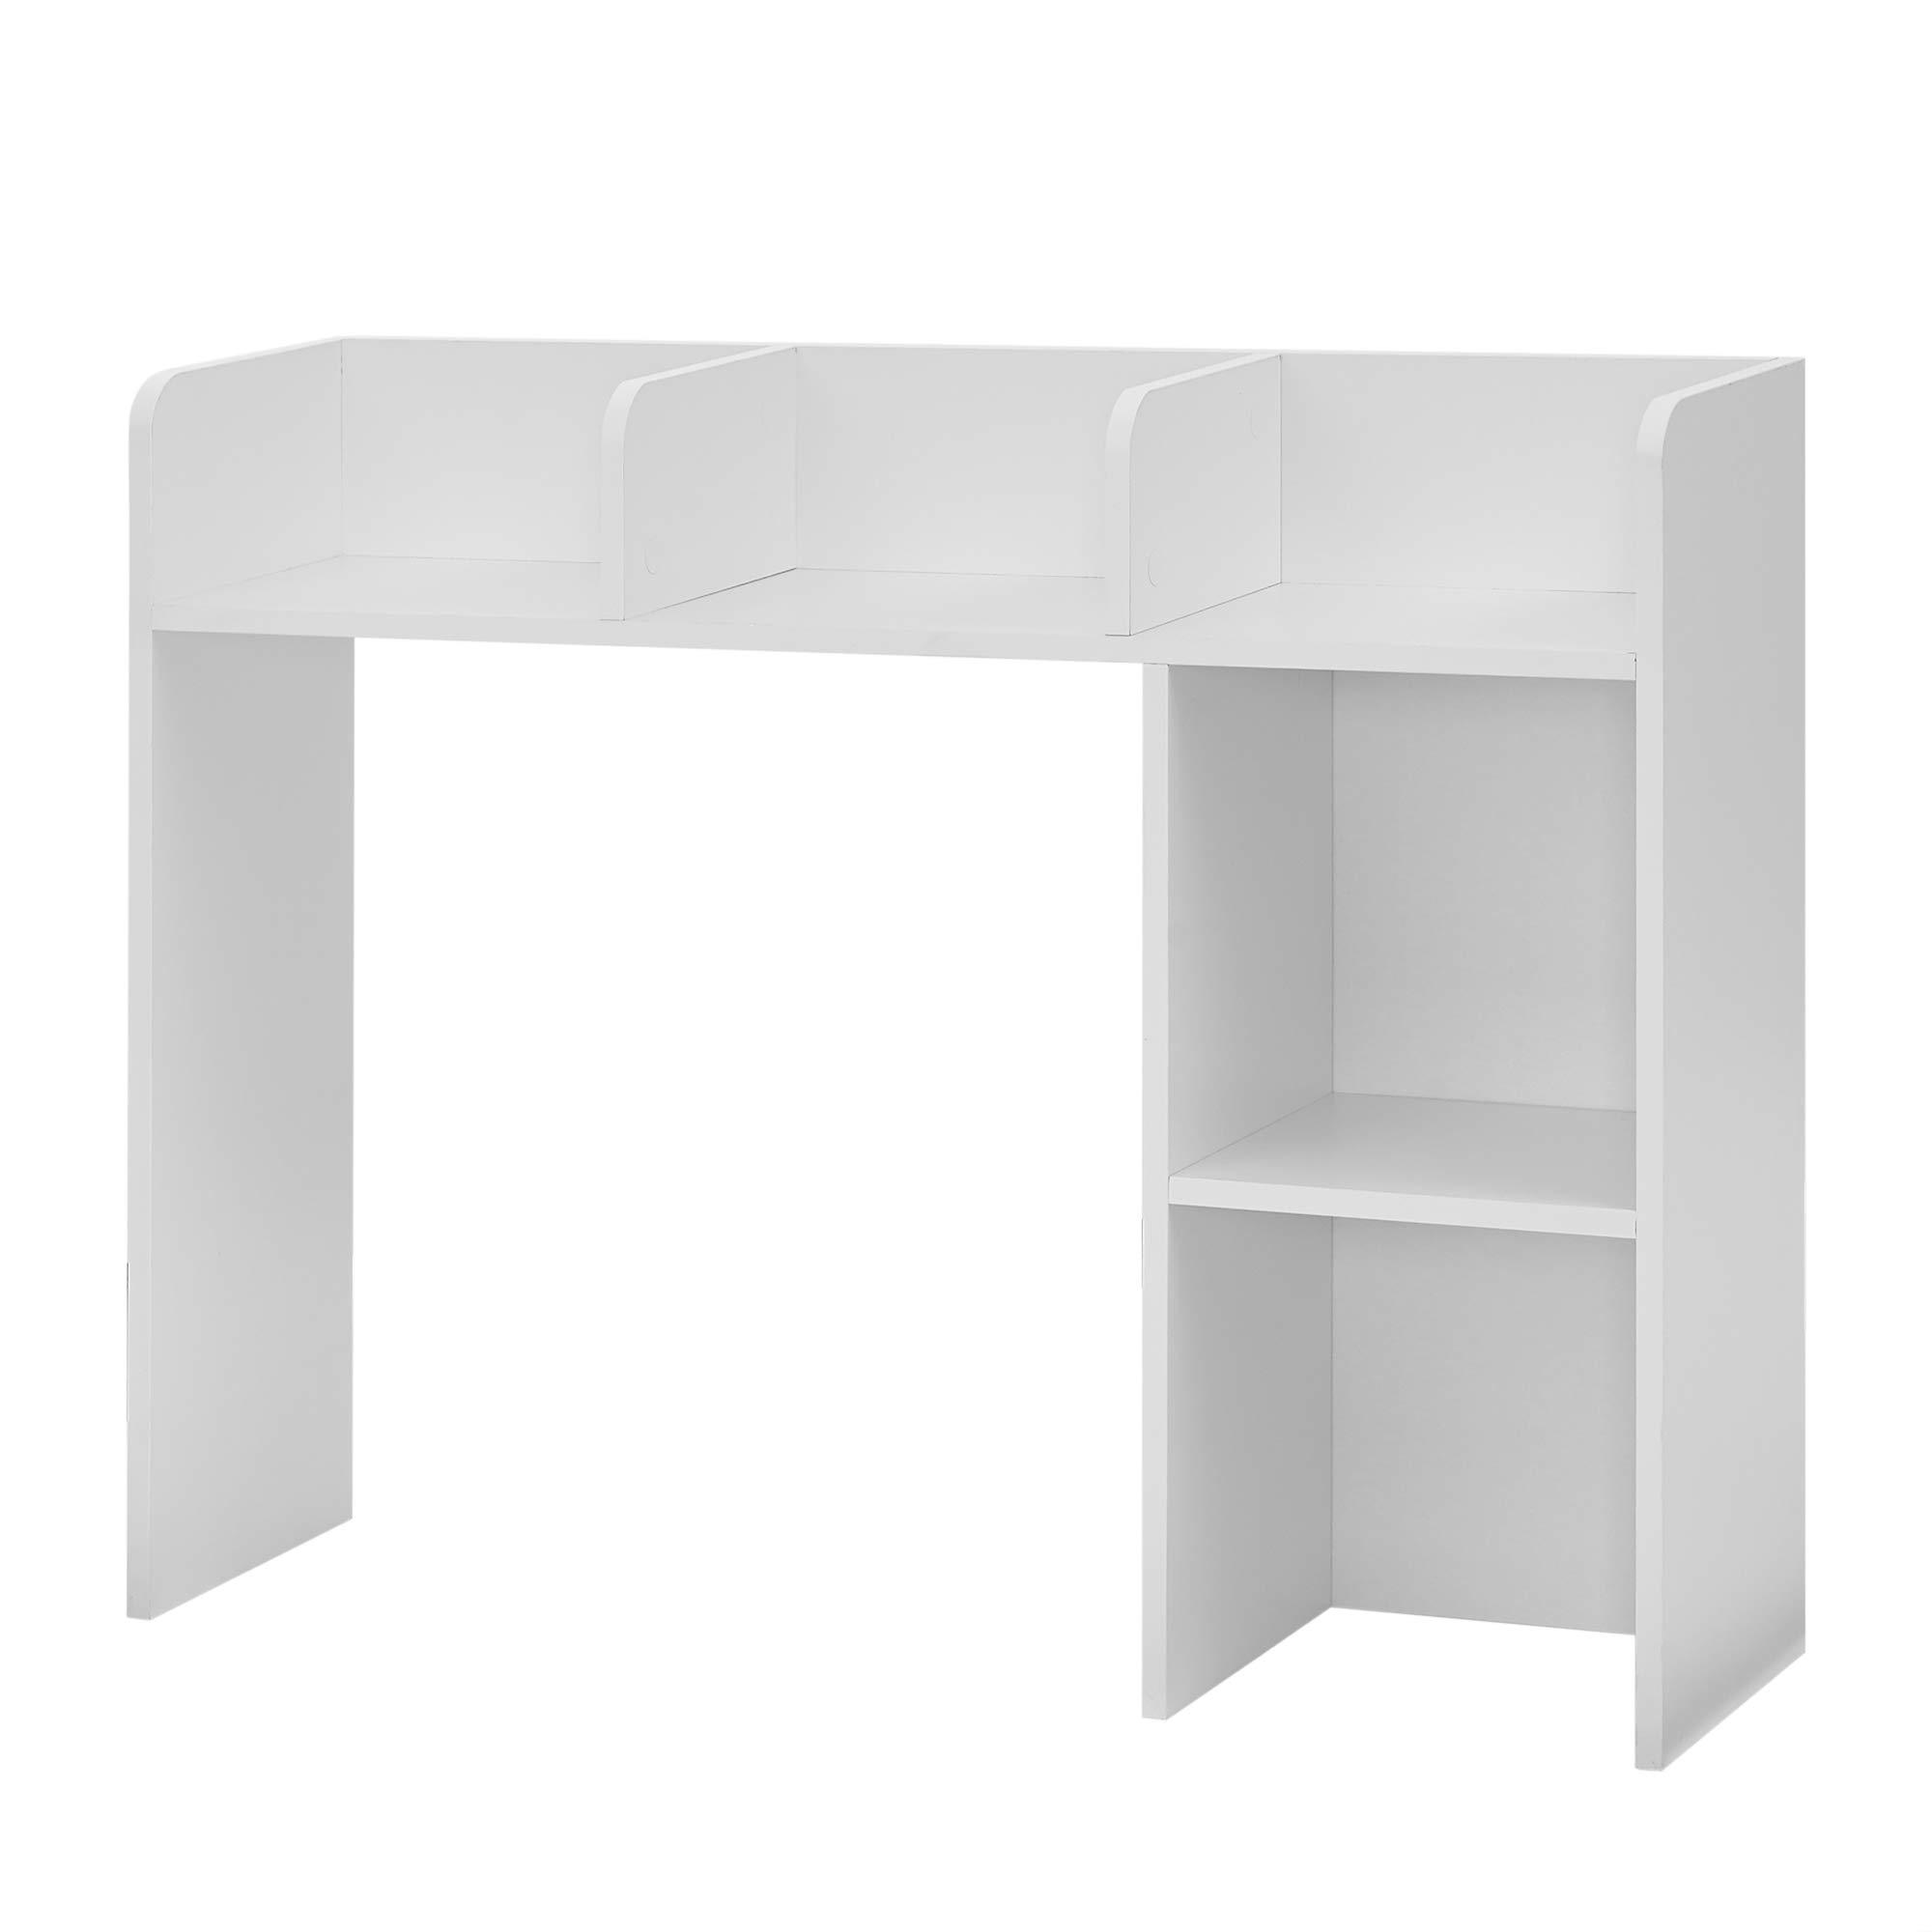 DormCo Classic Desk Bookshelf - White Color